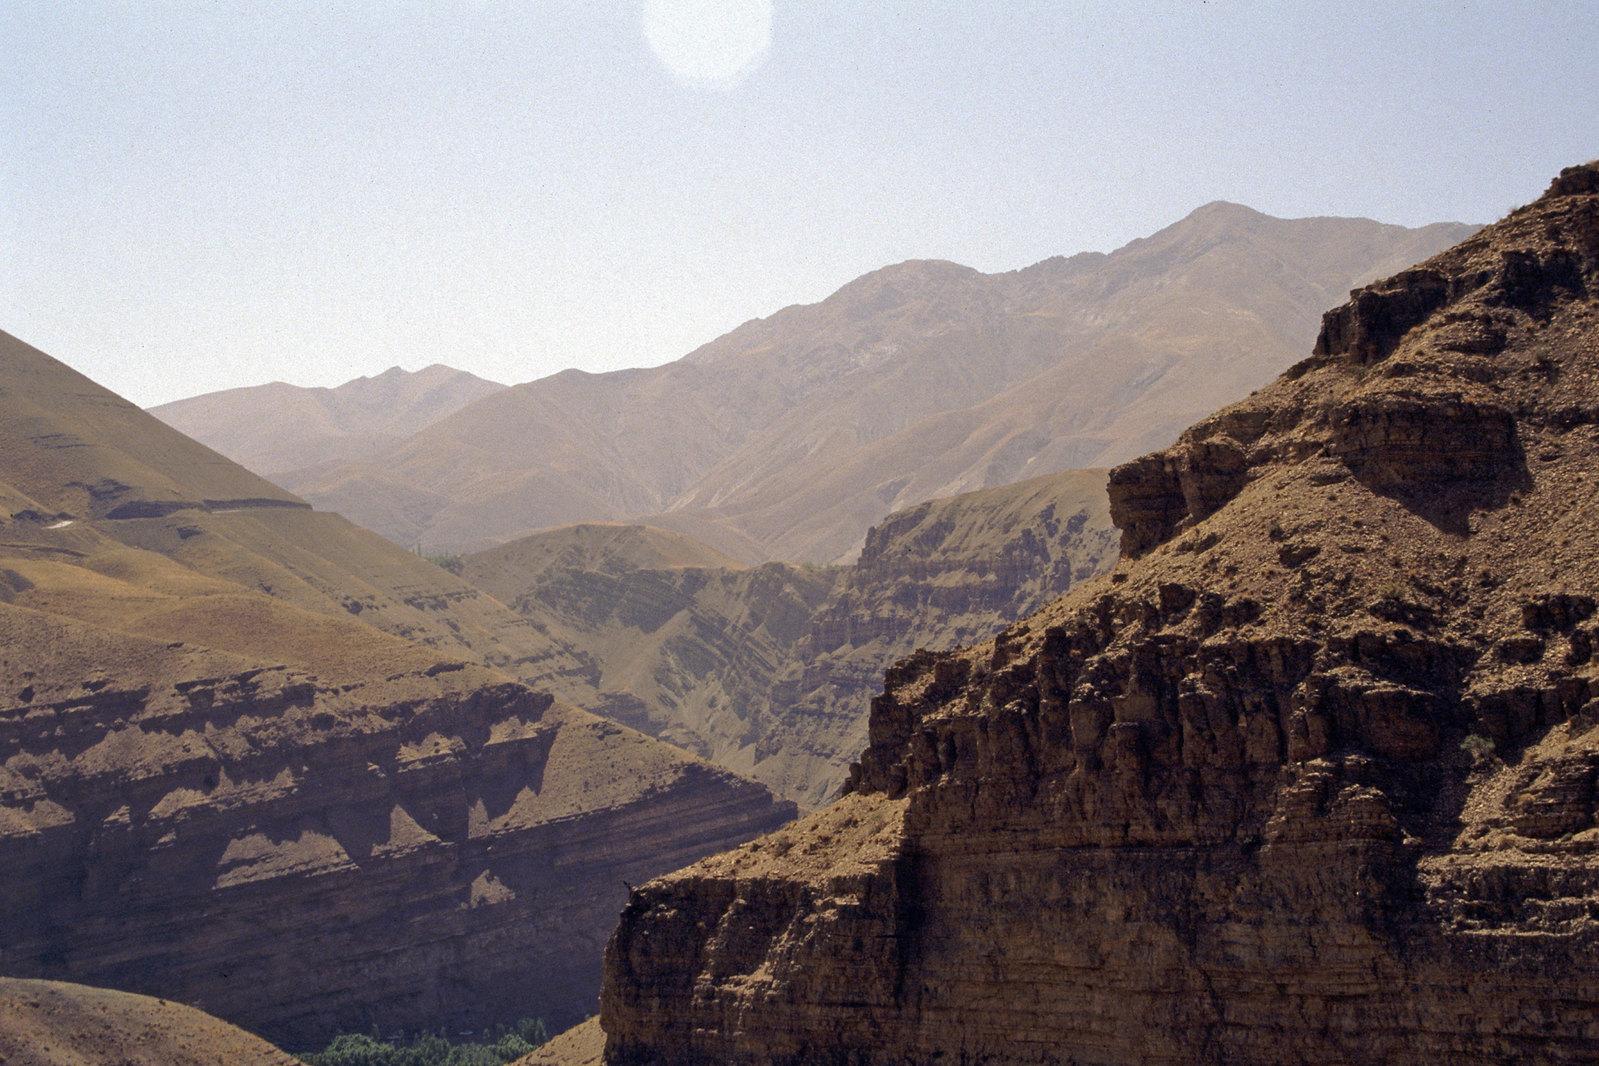 Road trip en Iran - Les pentes arides des Monts Elbourz